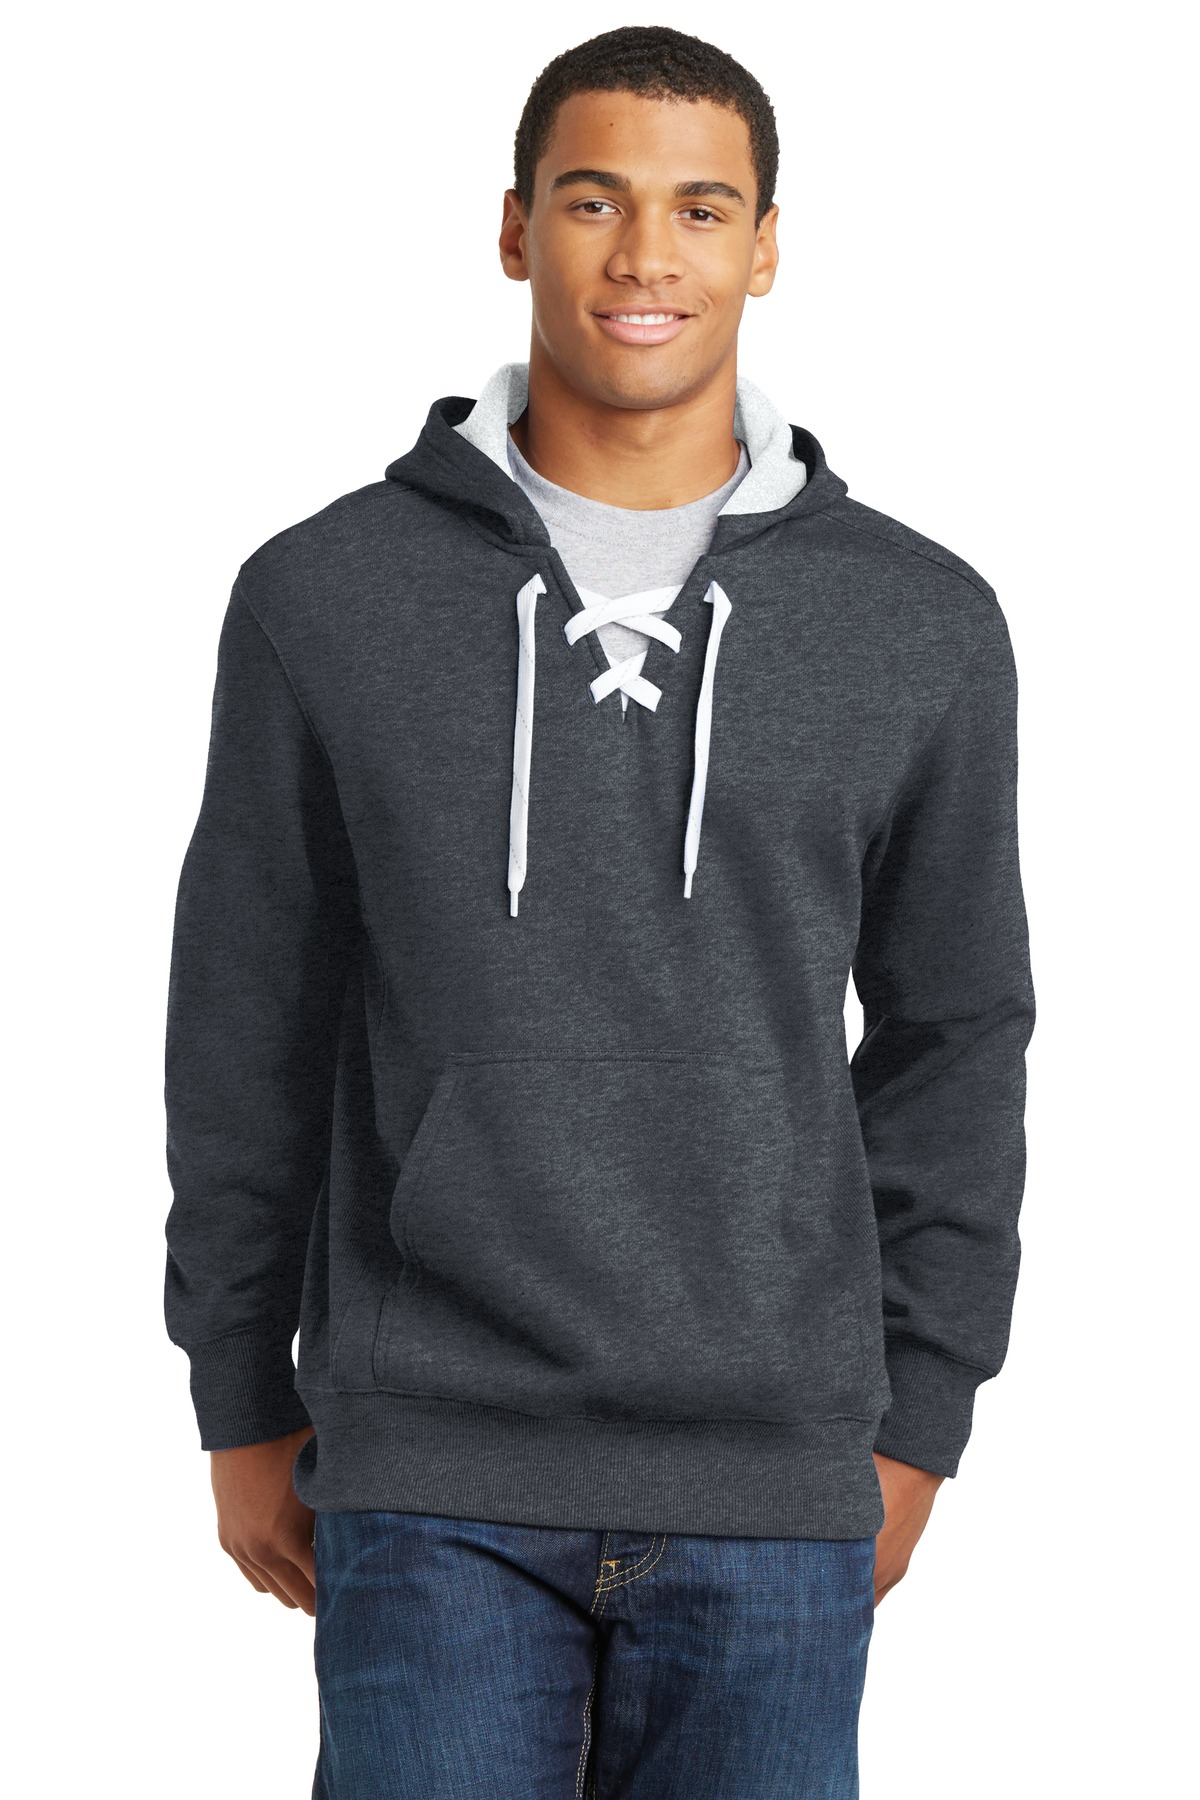 Sport-Tek® ST271 - Lace Up Pullover Hooded Sweatshirt